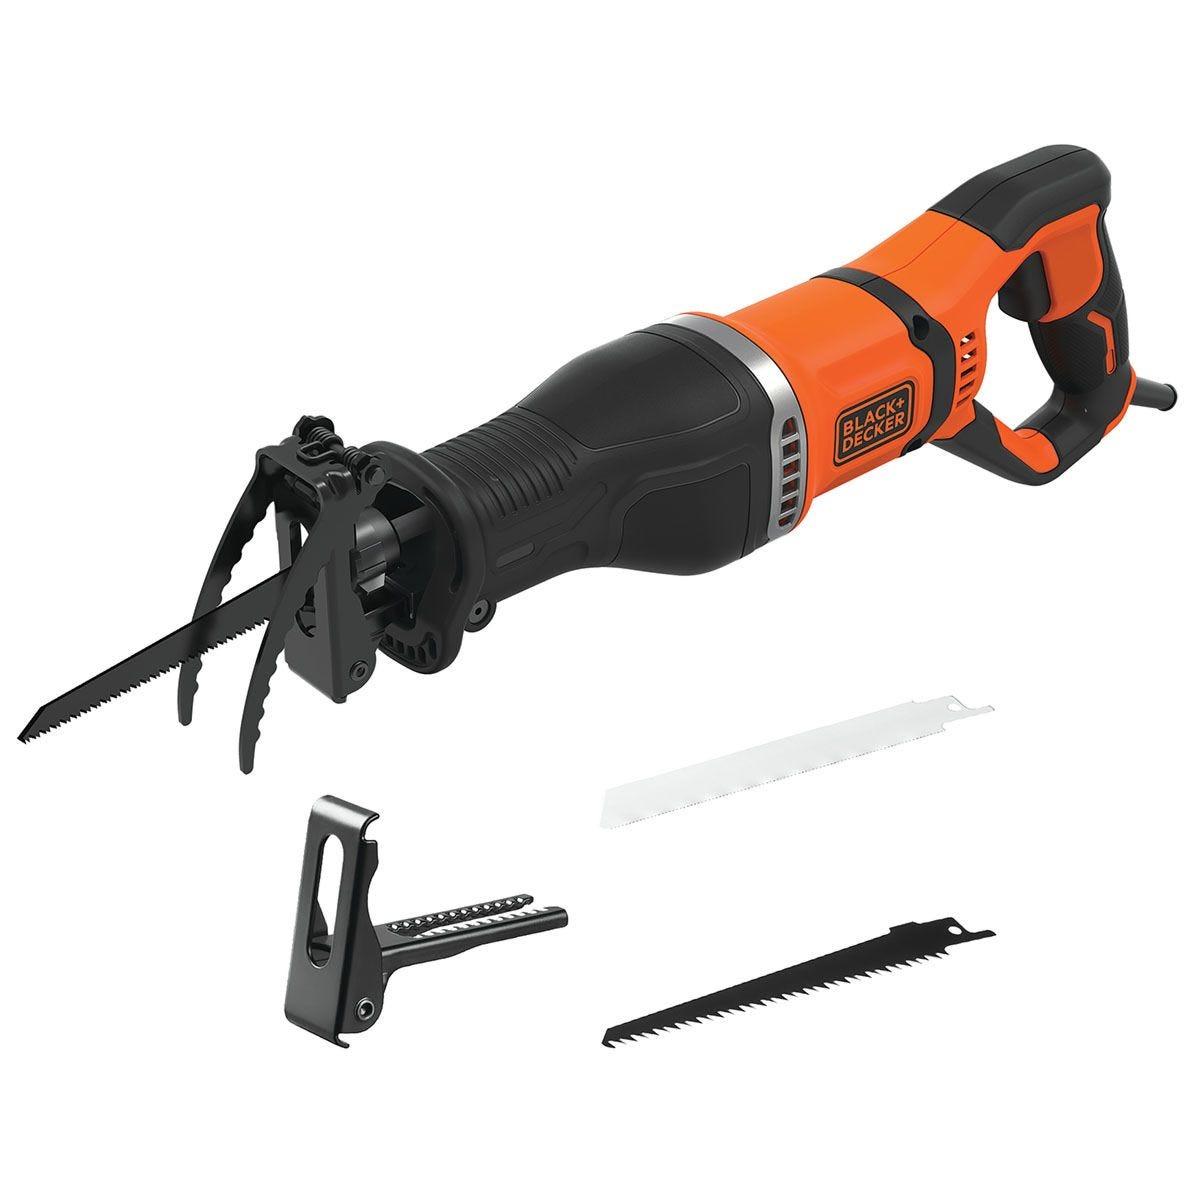 Black & Decker 750W Reciprocating Saw 240V - Orange